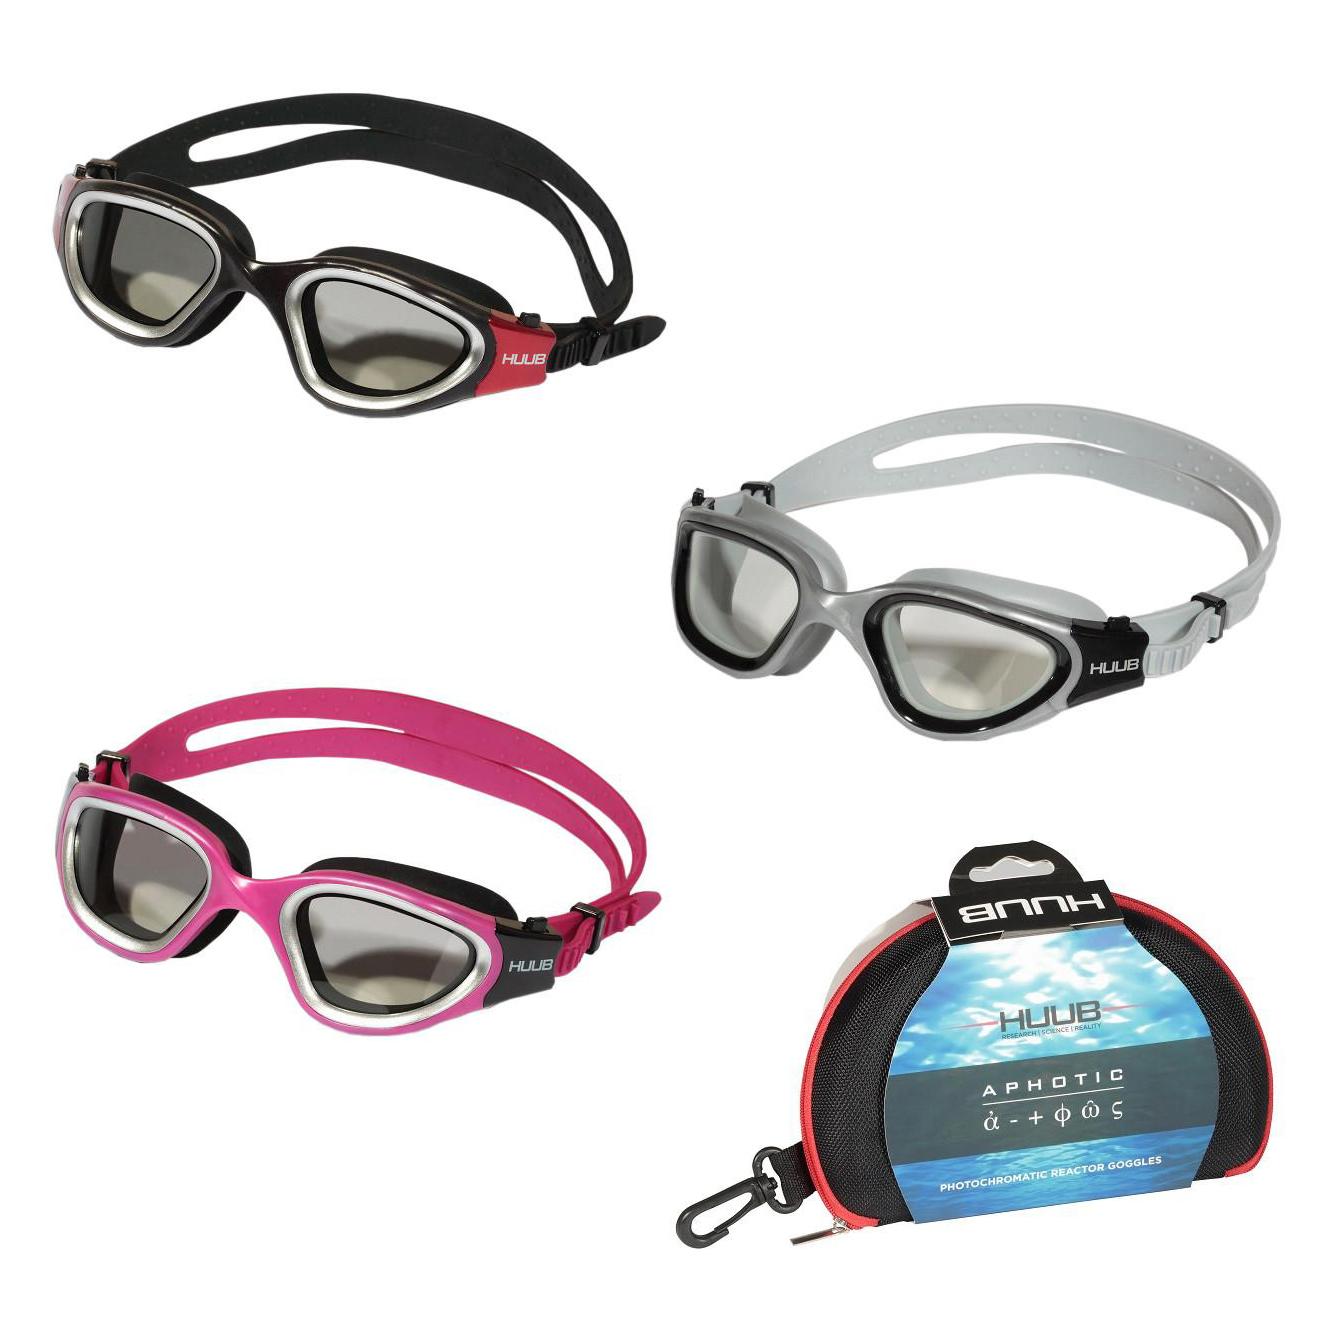 0999010f63c Details about HUUB Aphotic Tri Swim Goggle Swimming Triathlon Open Water  Goggles in 4 Colours